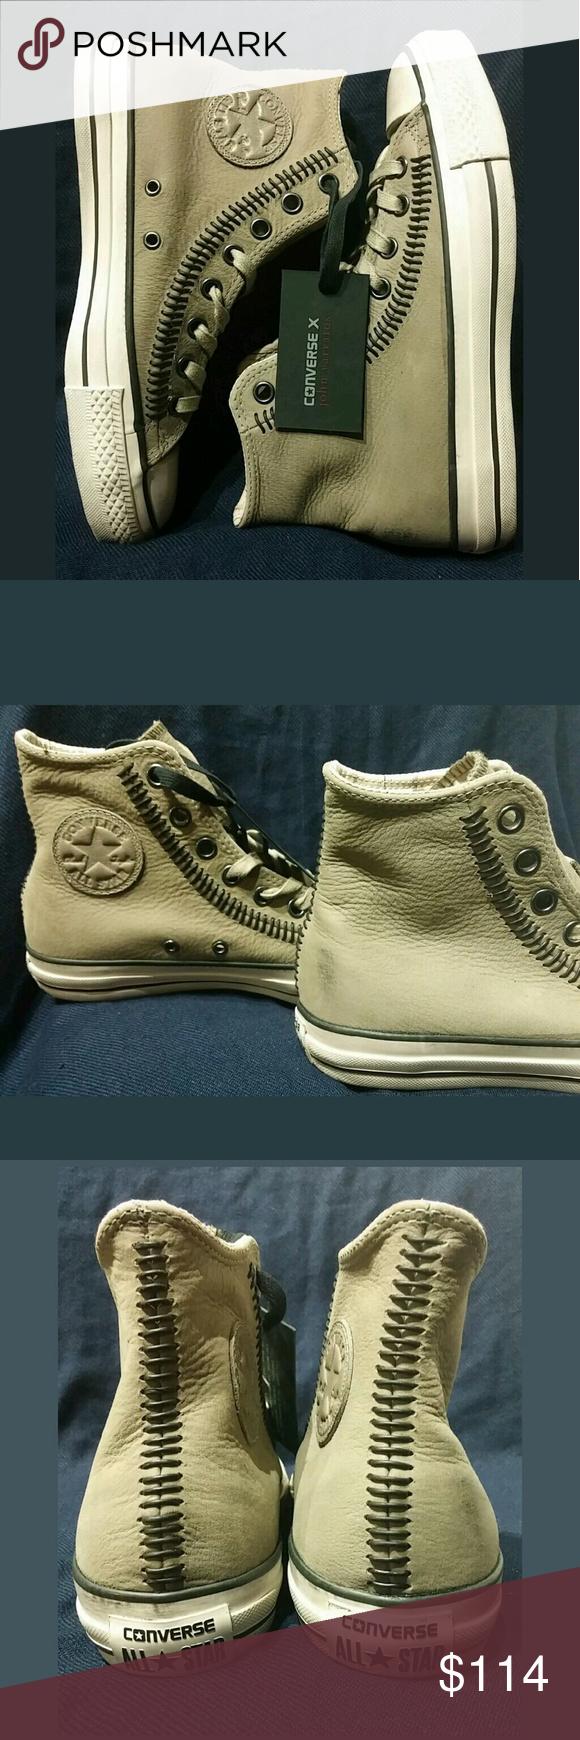 c0002e57befbb7 Artisan · Stitch · Converse John Varvatos Chuck Taylor Hi Top Leather NWT!  Very nice! 100% Authentic